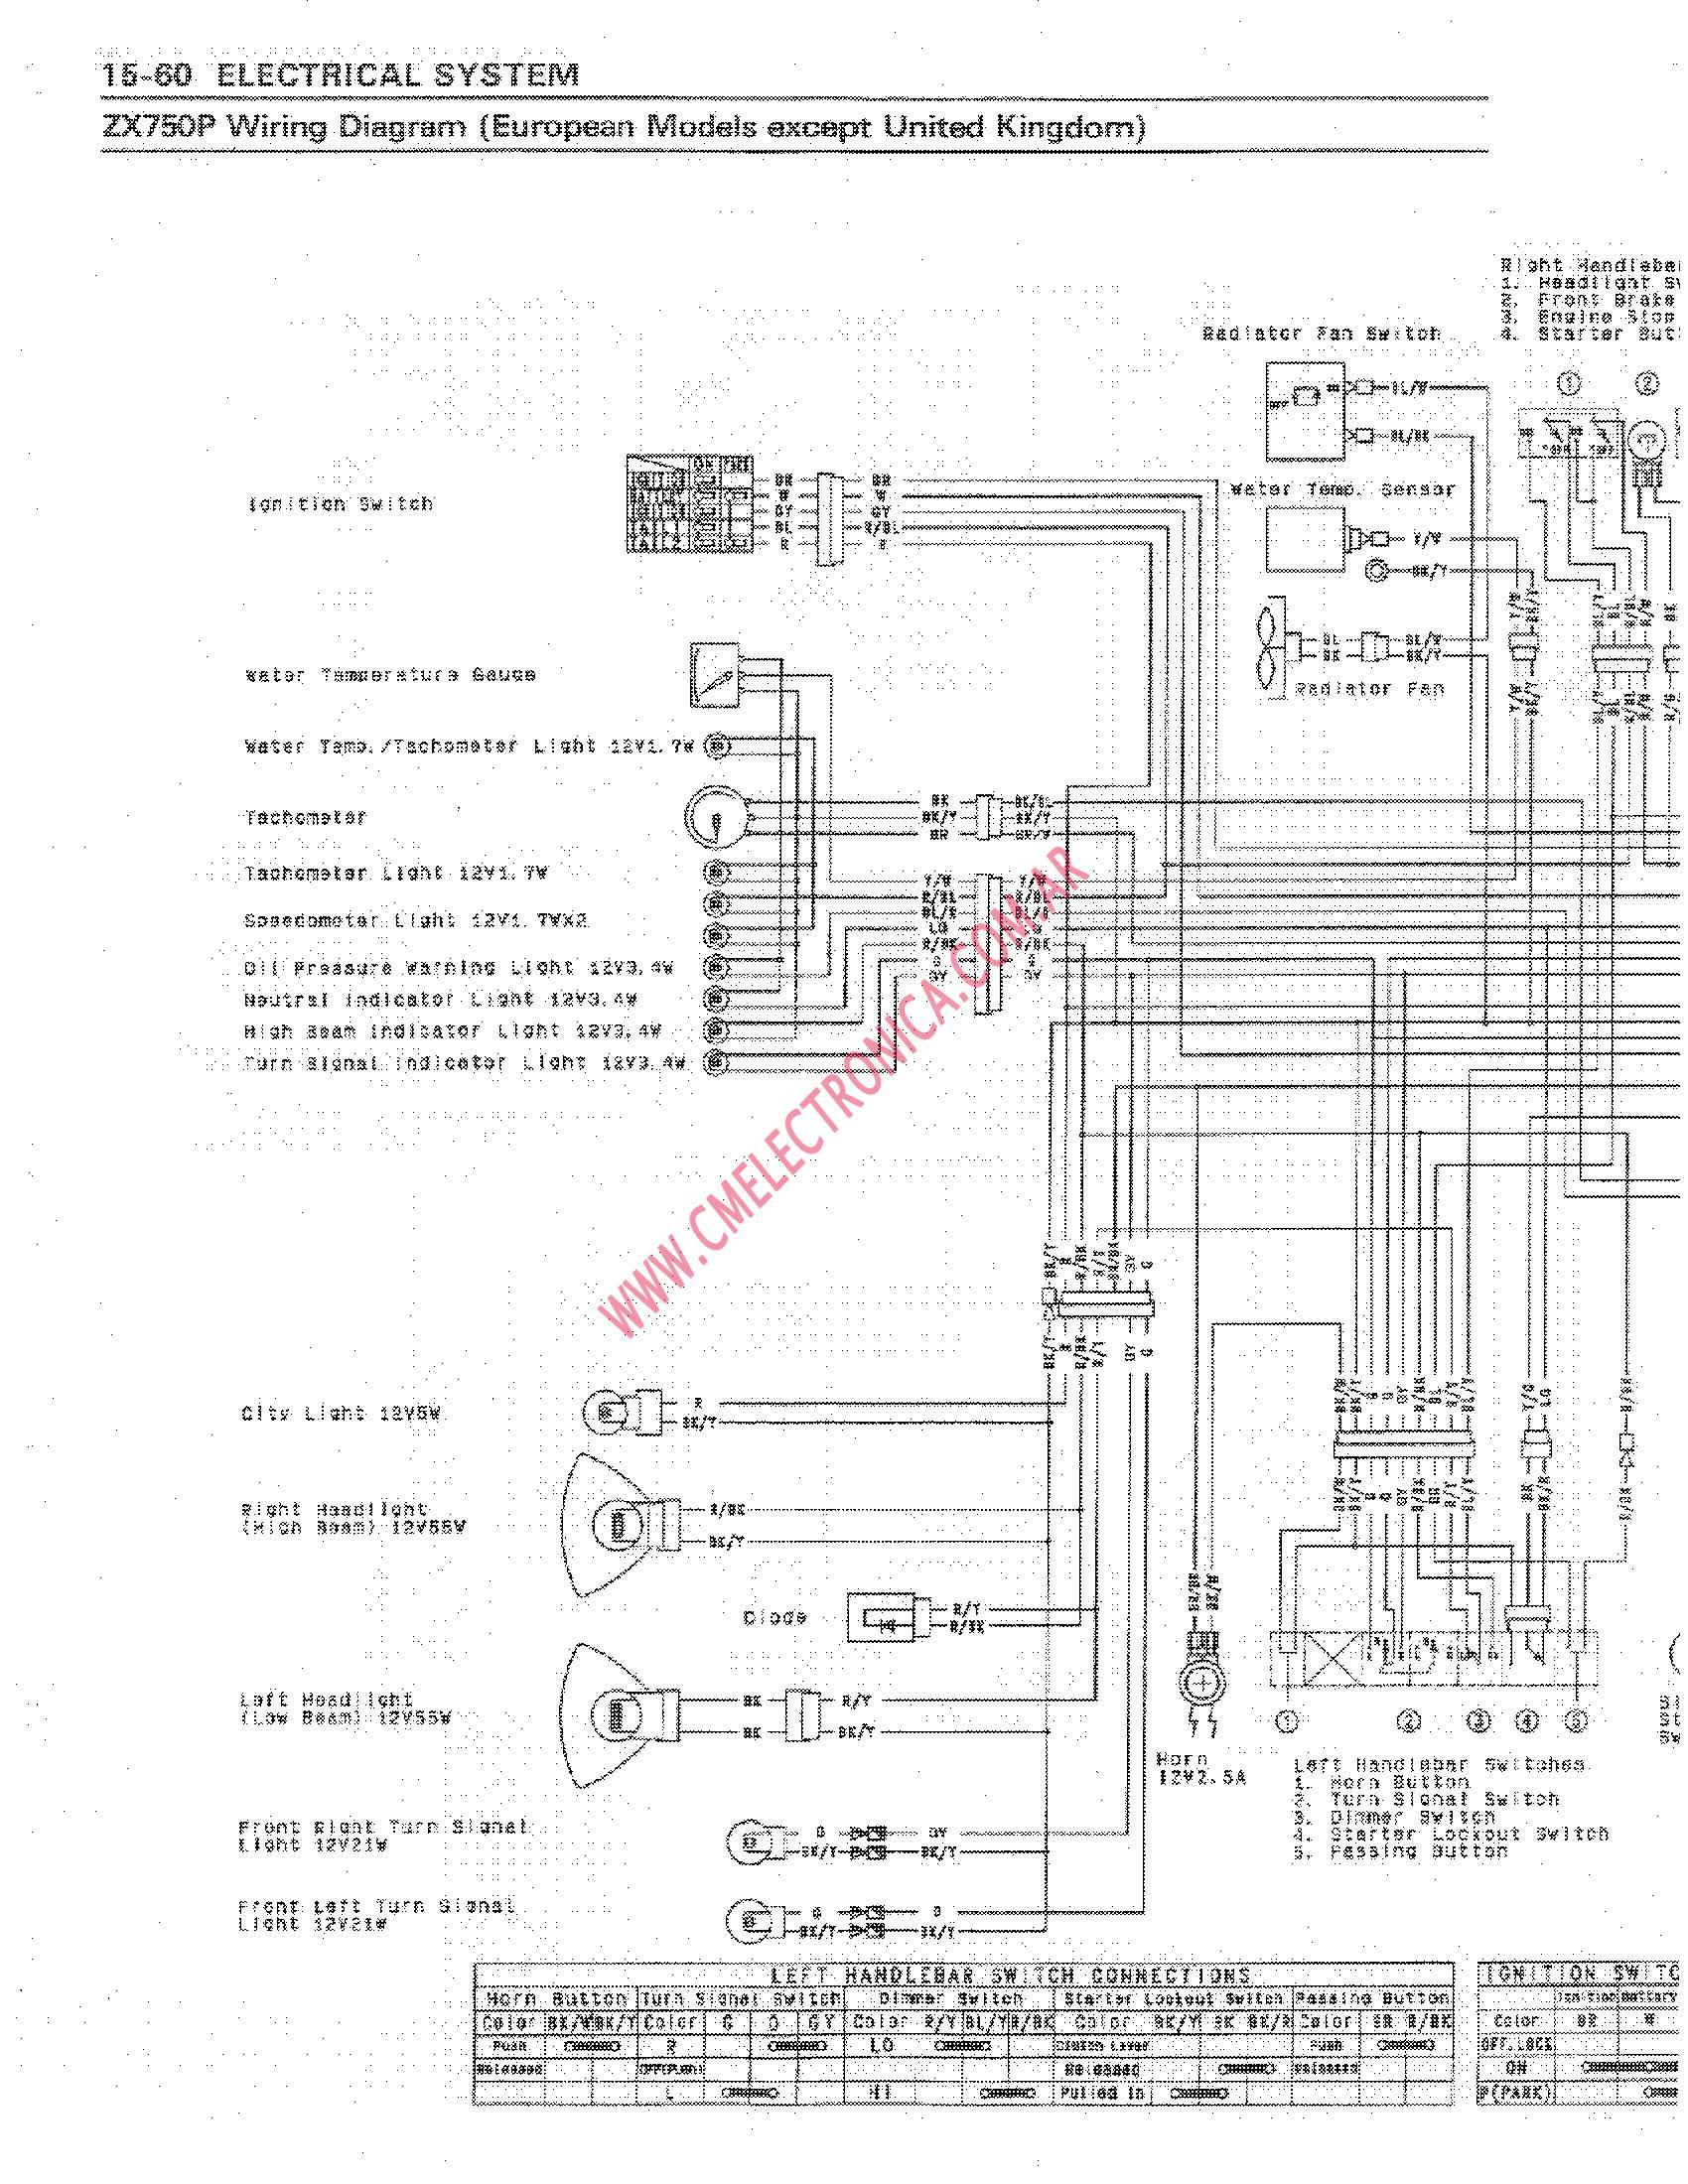 hayabusa wiring diagram for 95 hb 3832  wiring also kawasaki ninja 750 wiring diagram on kawasaki  kawasaki ninja 750 wiring diagram